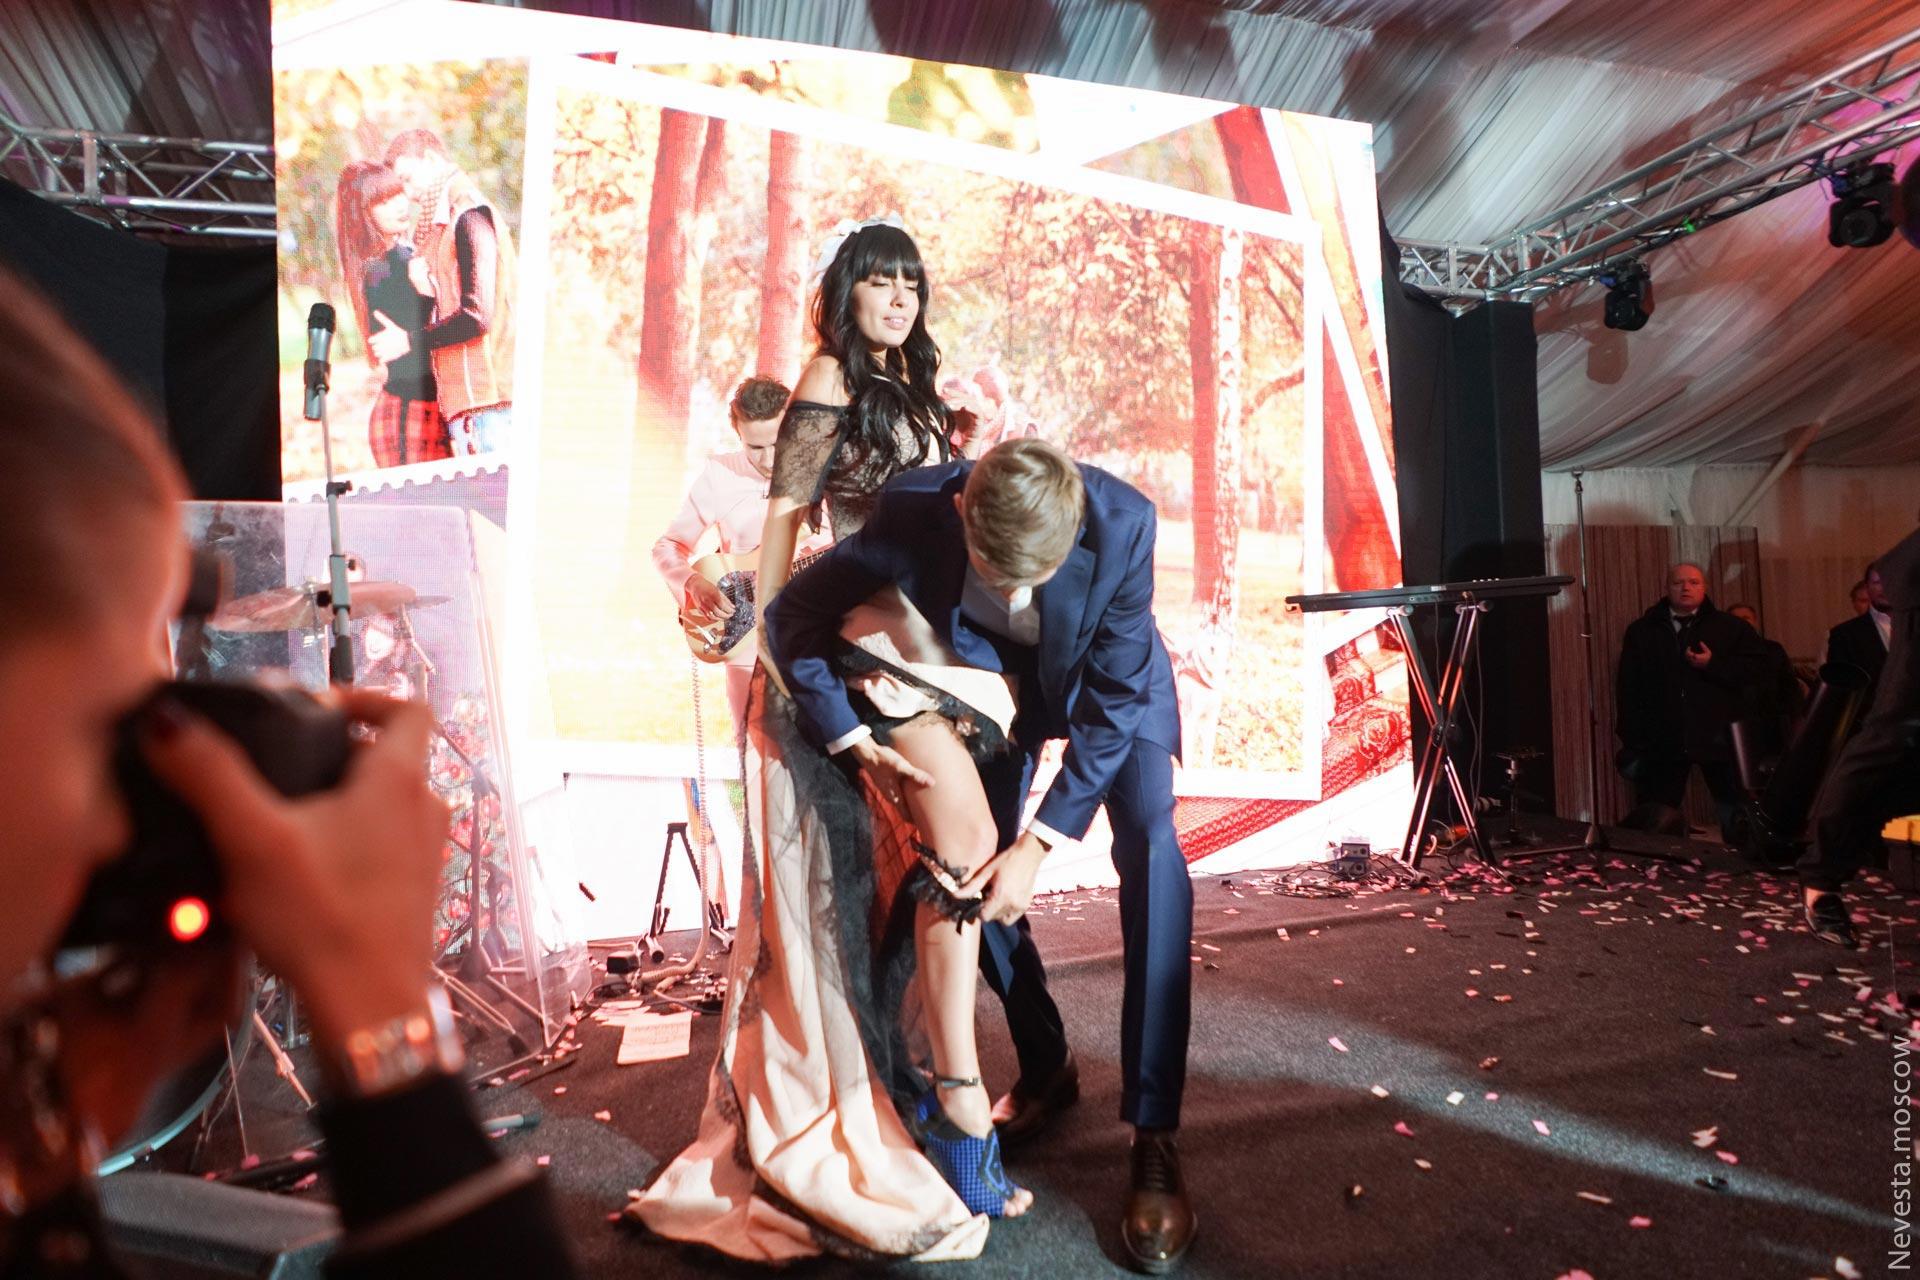 Свадьба Нелли Ермолаевой и Кирилла Андреева фото 55